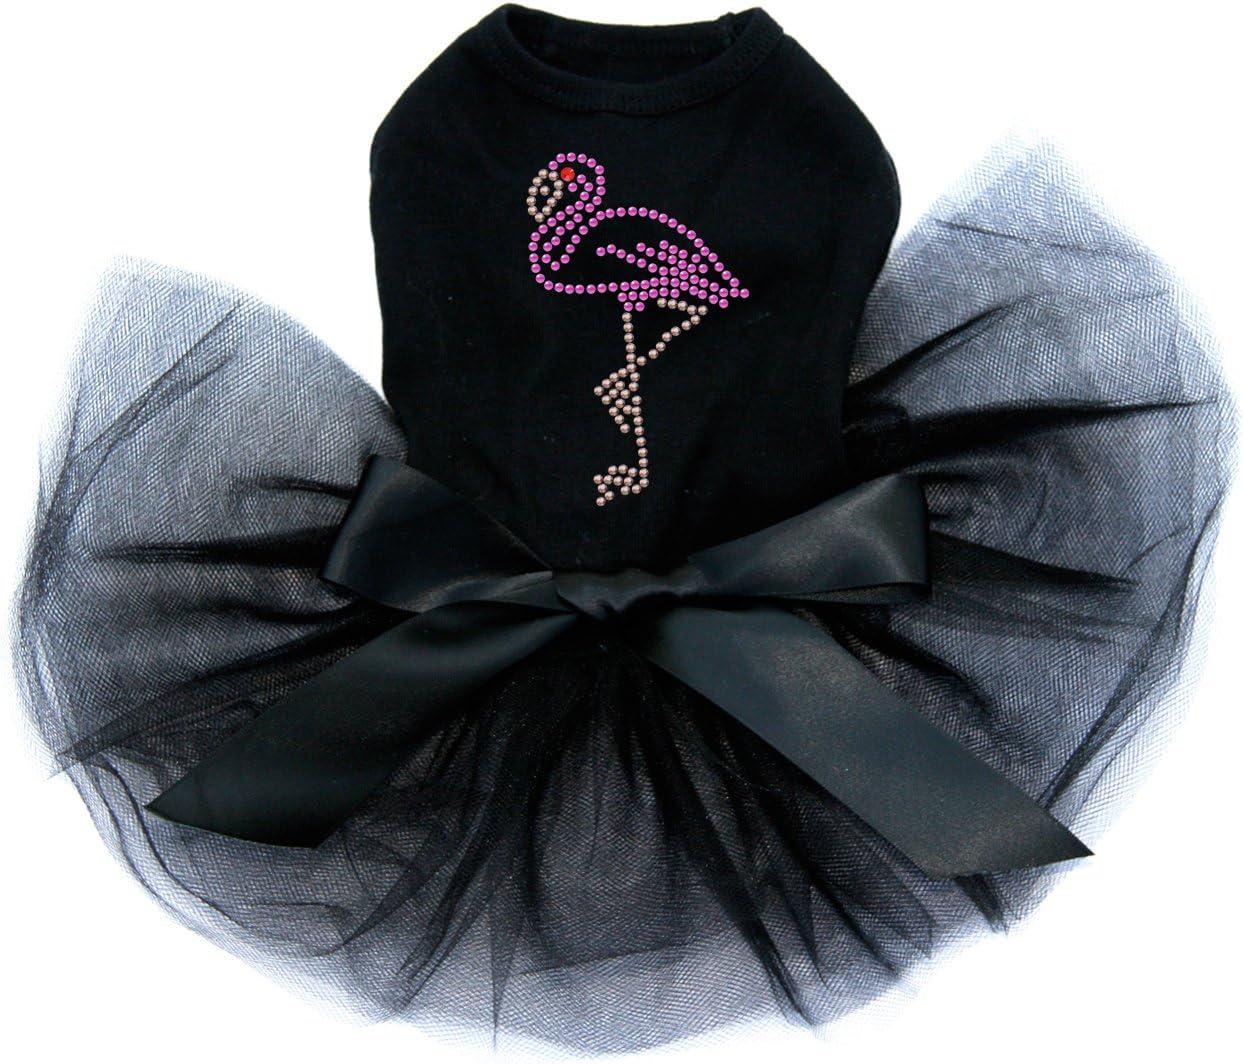 Direct stock discount Pink Flamingo - Small Bling Rhinestone Dress M Dog Black Max 41% OFF Tutu